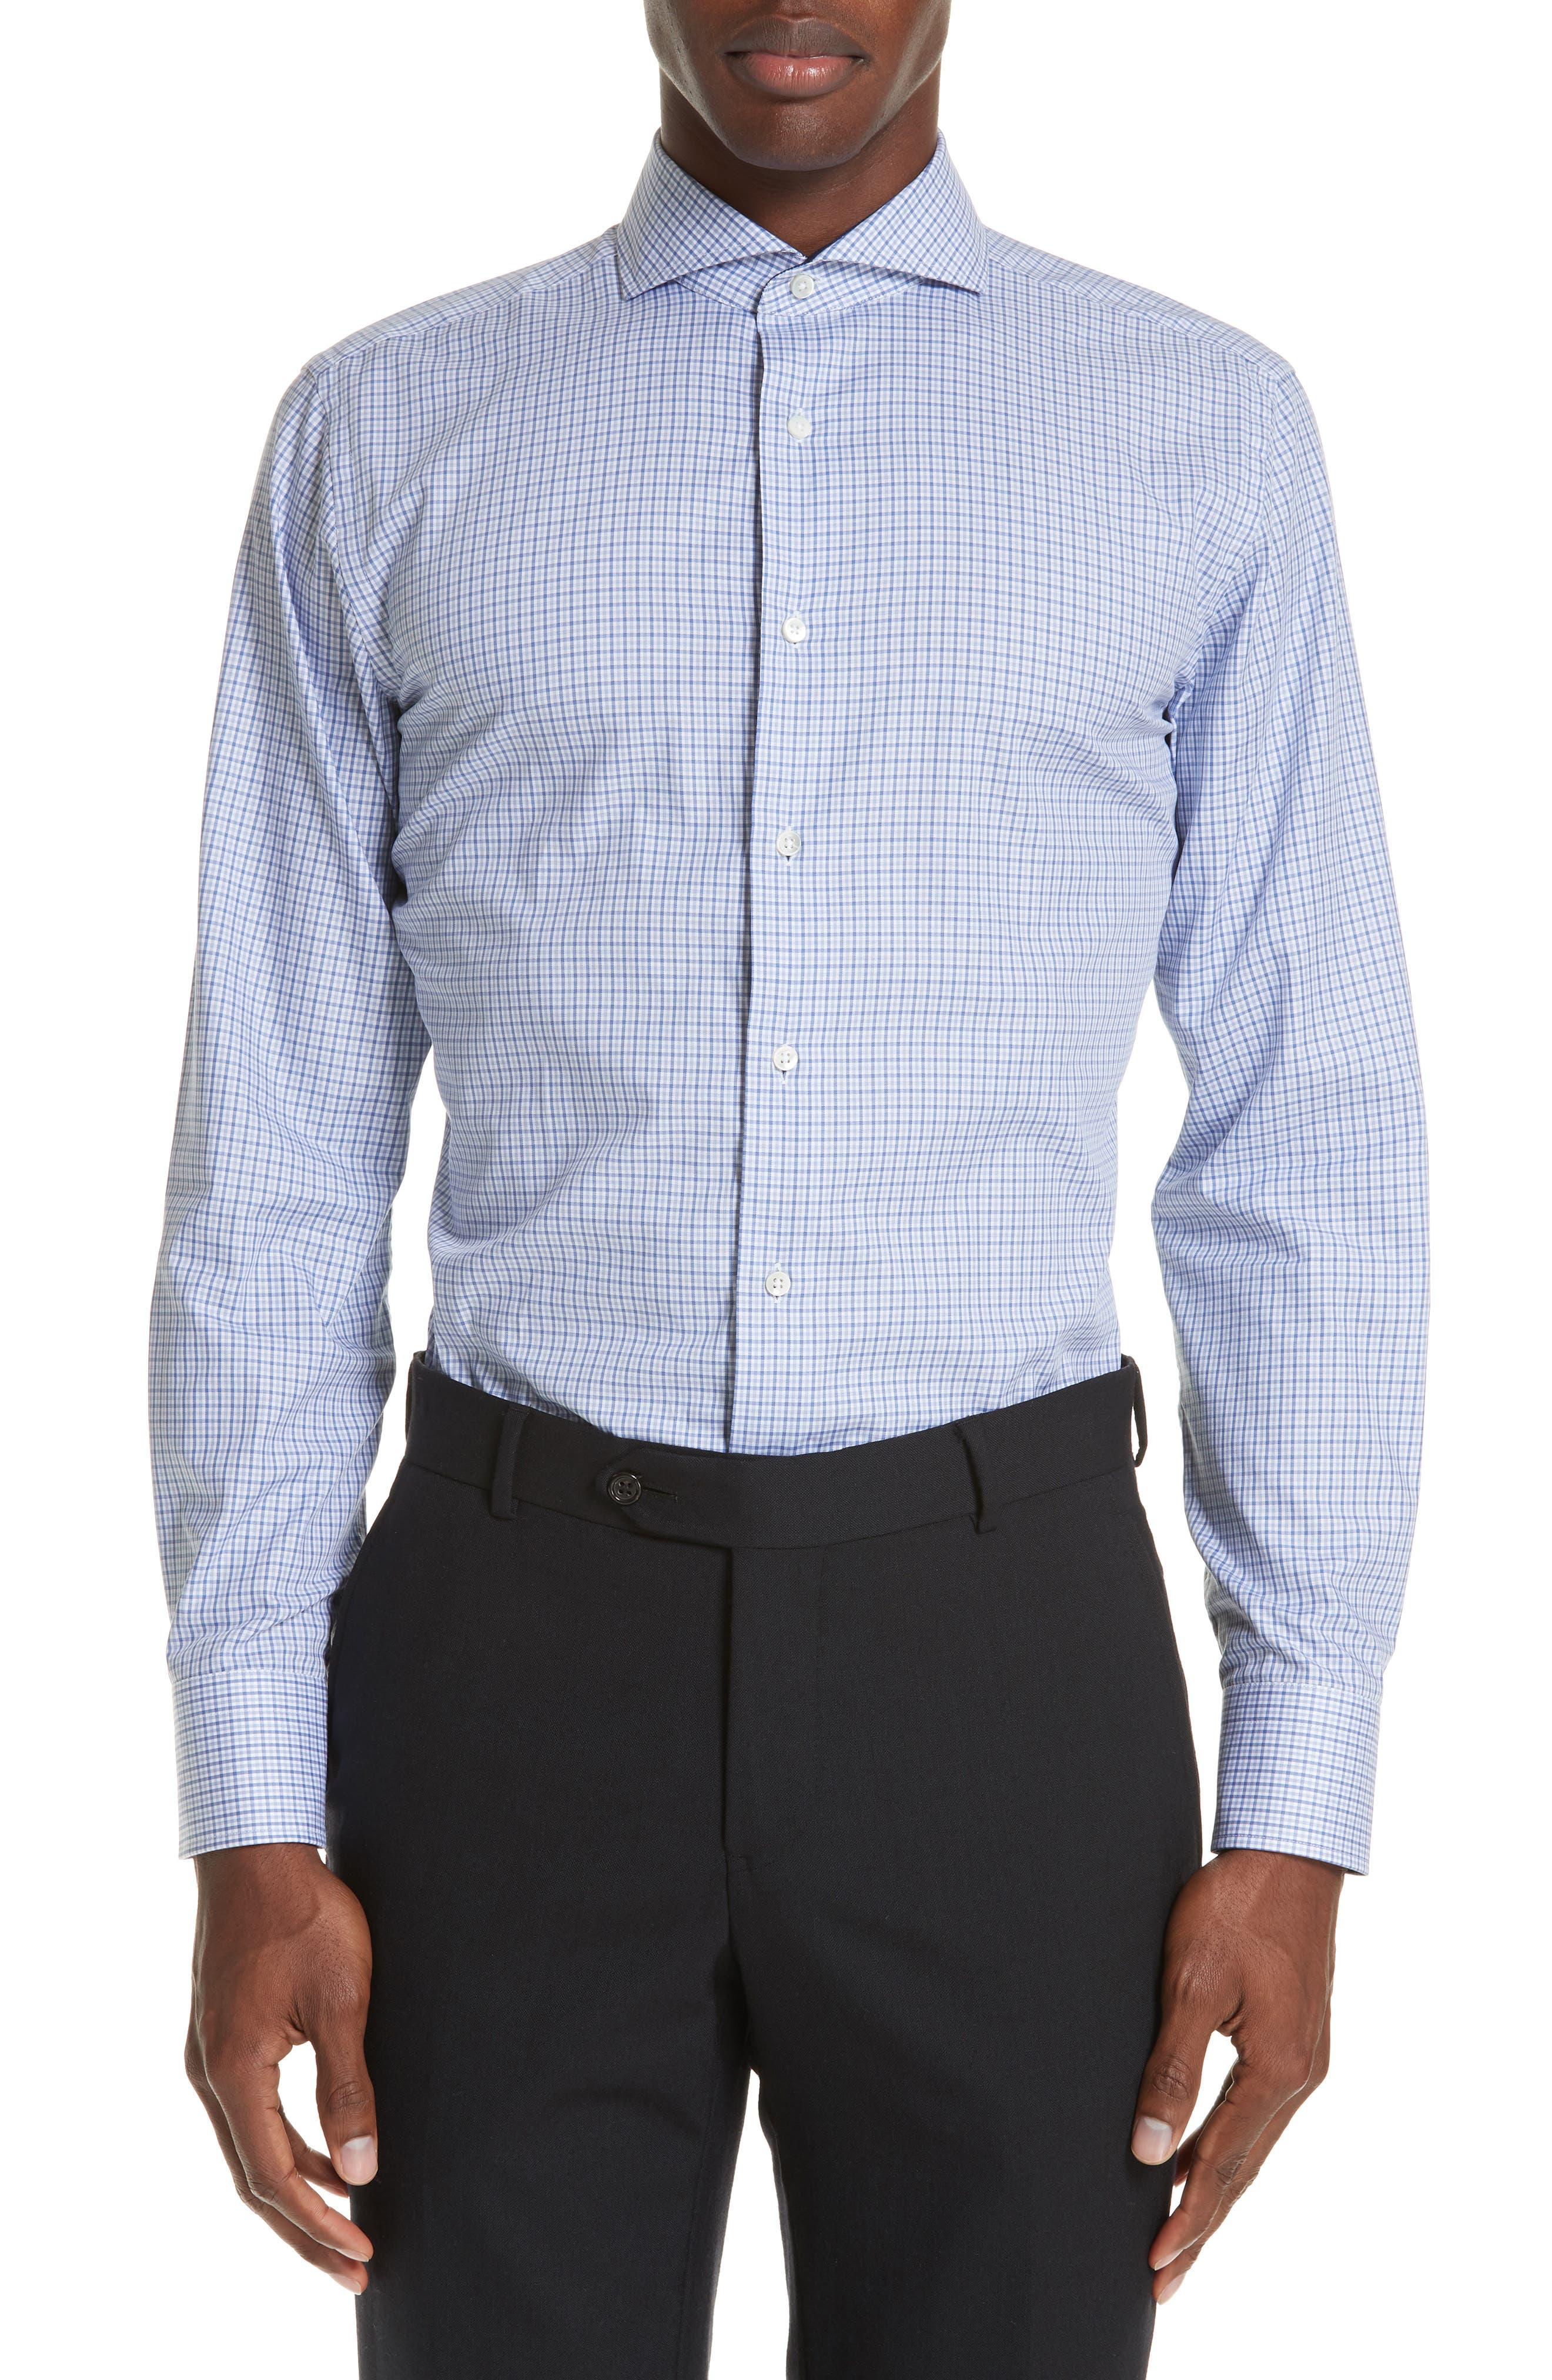 Regular Fit Check Dress Shirt,                             Main thumbnail 1, color,                             Medium Blue